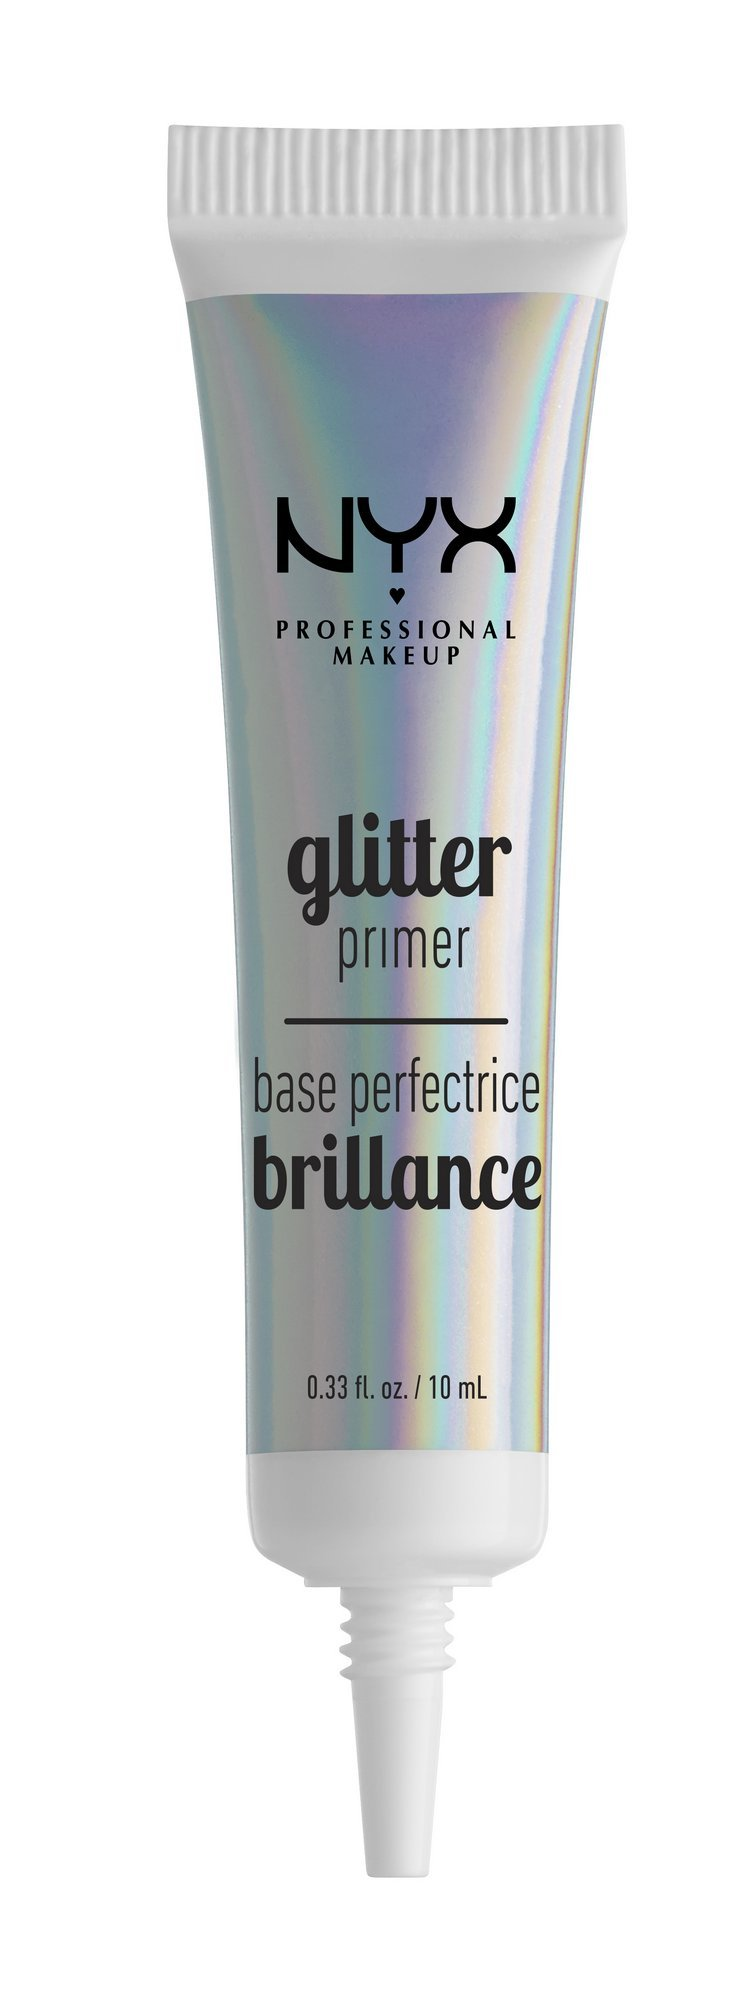 NYX PROFESSIONAL MAKEUP Glitter Primer, 0.33 Fluid Ounce